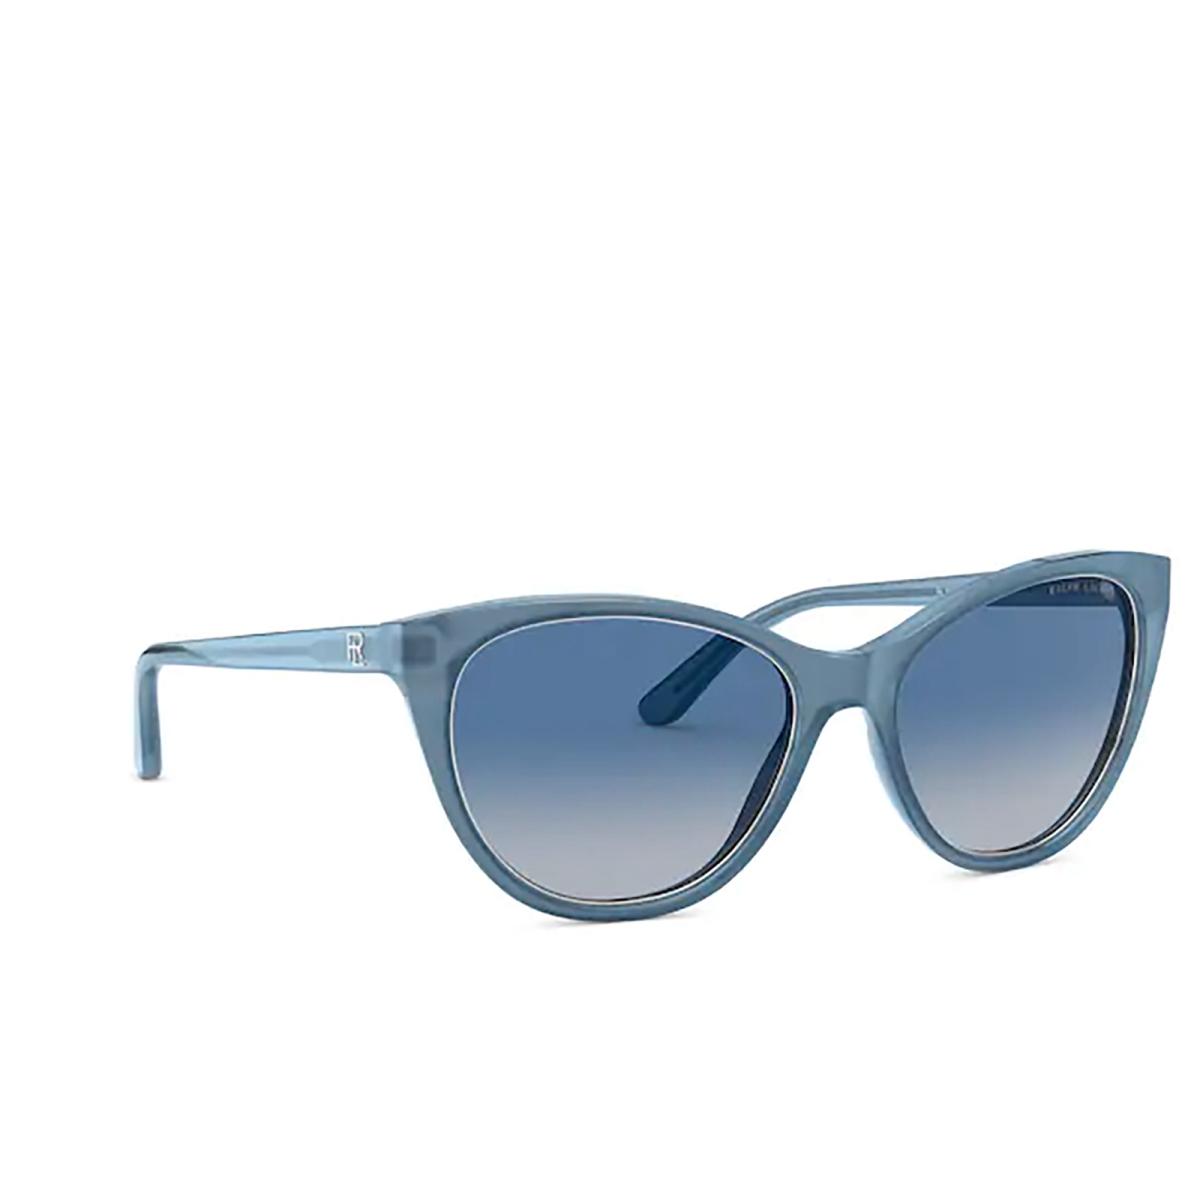 Ralph Lauren® Cat-eye Sunglasses: RL8186 color Pearl Light Blue 53774L - three-quarters view.